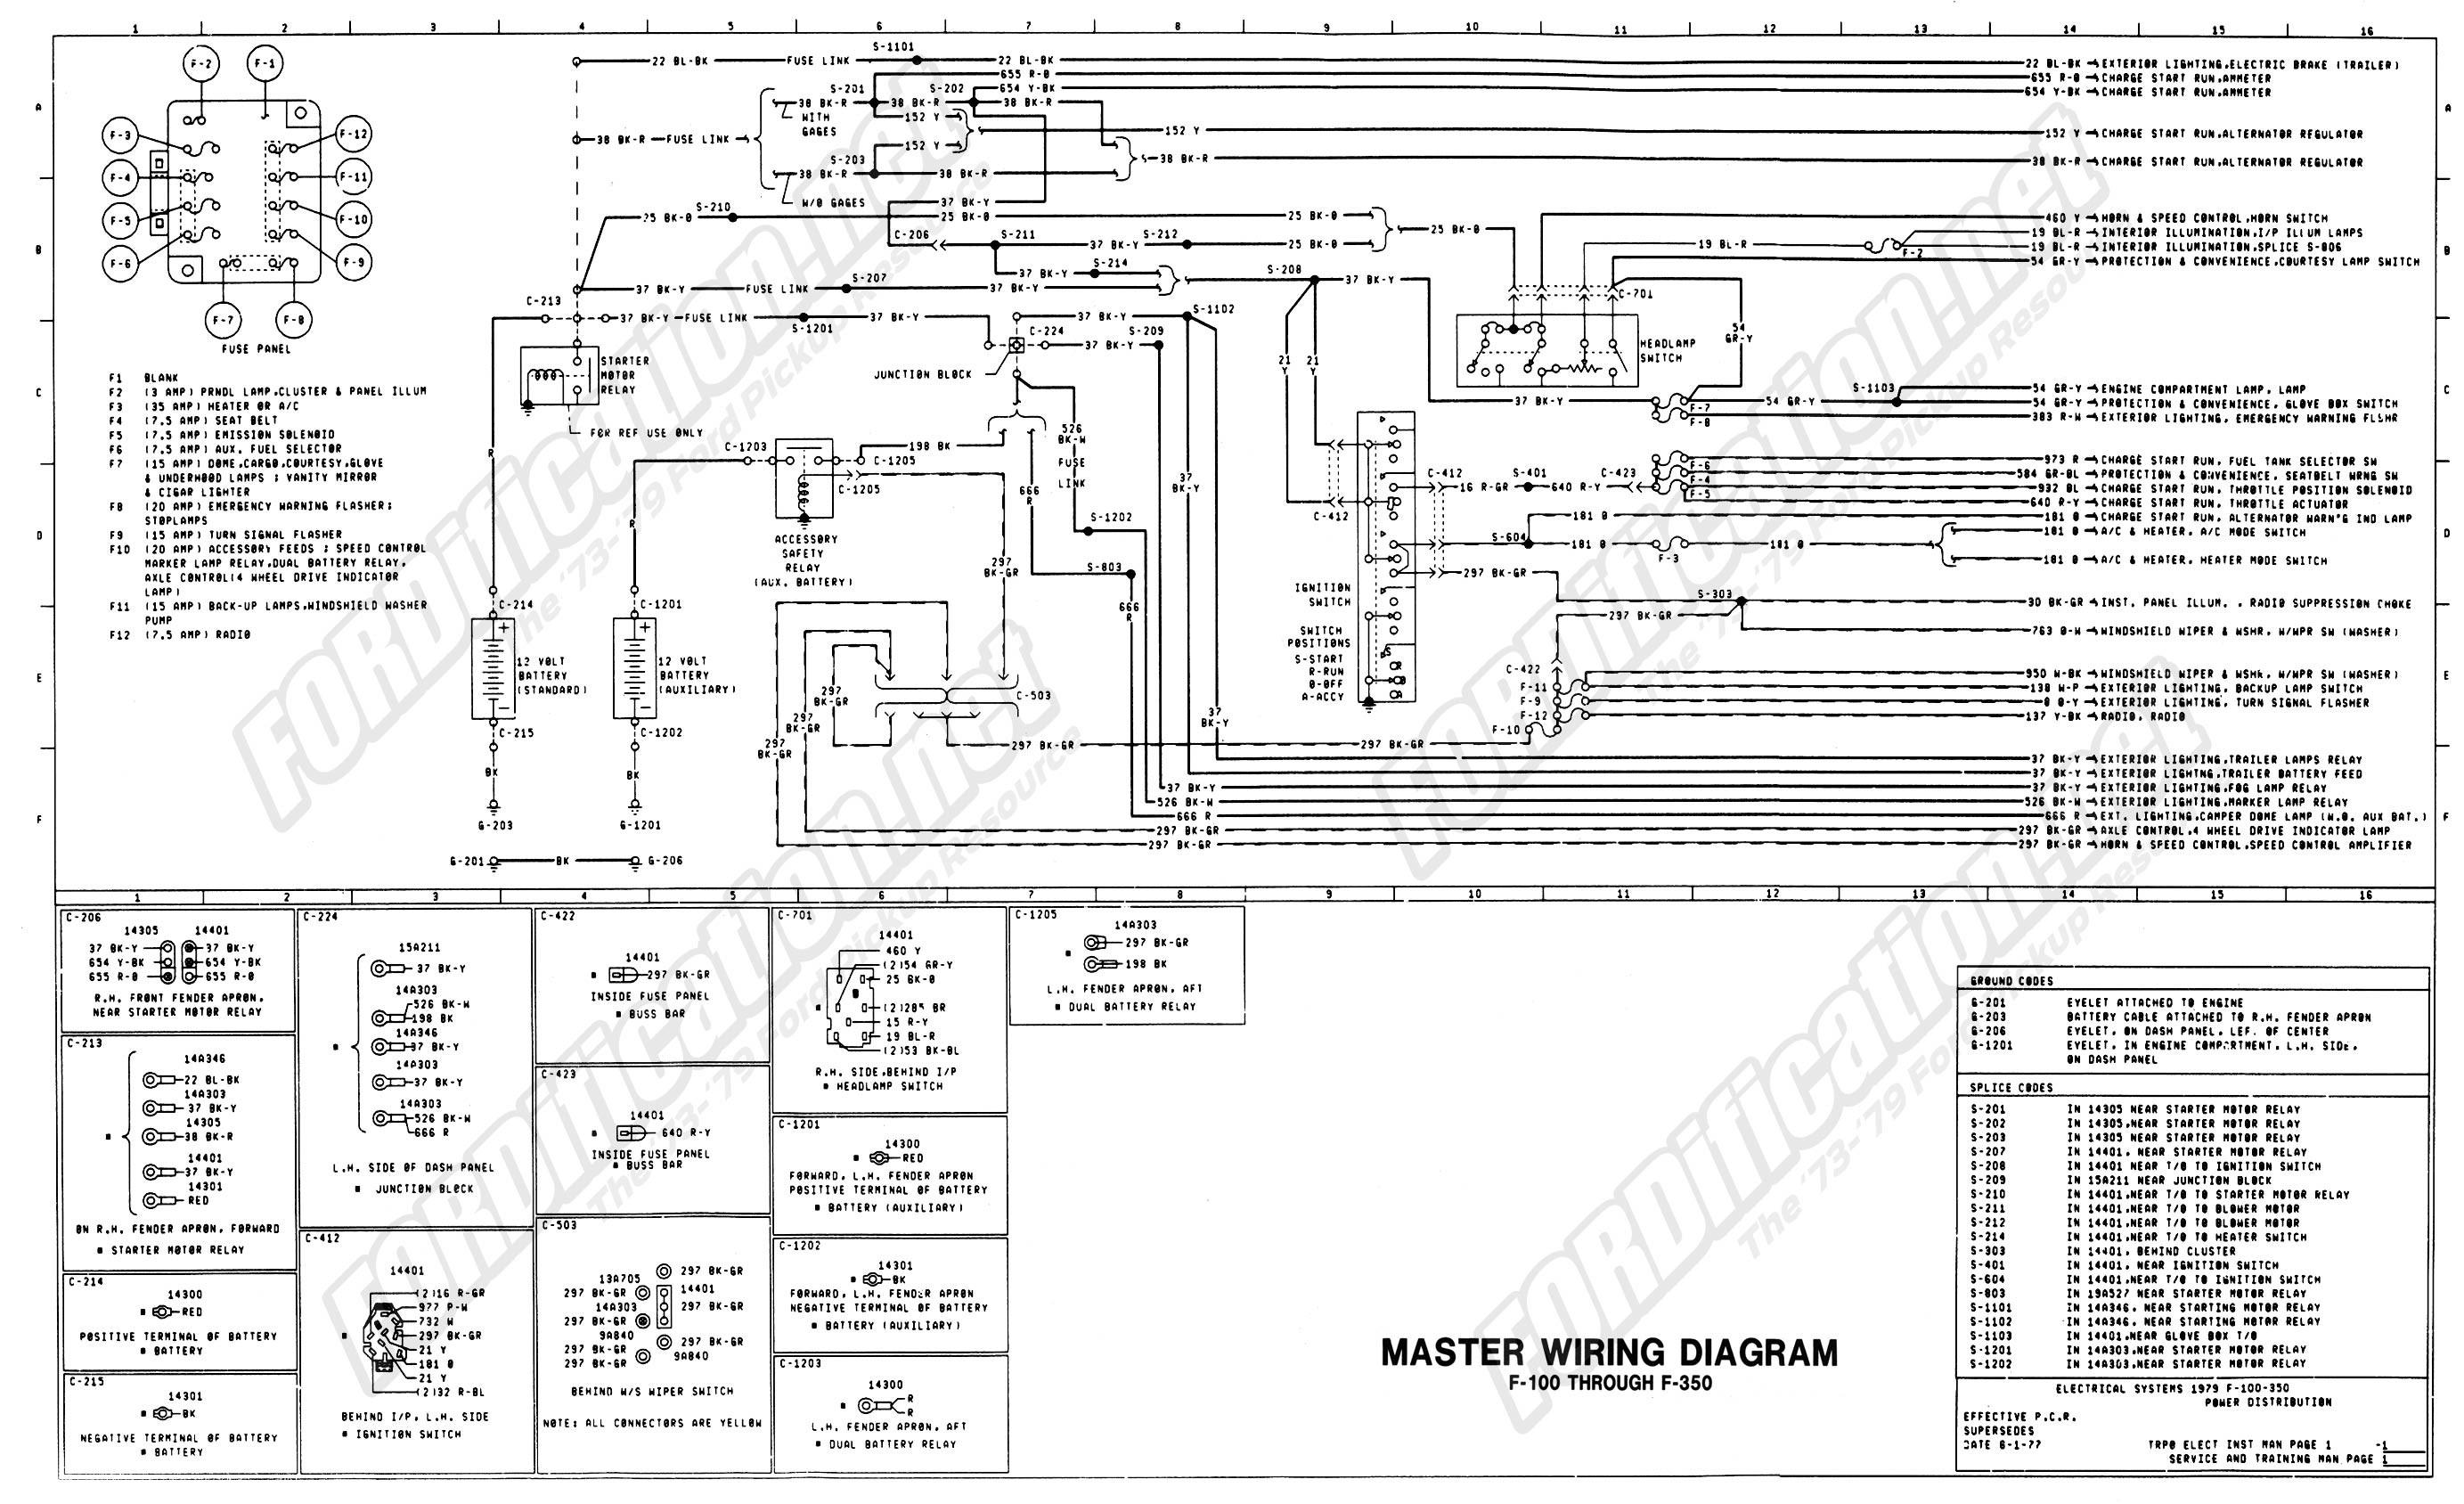 2006 Sterling Wiring Diagram Free Download • Playapk.co